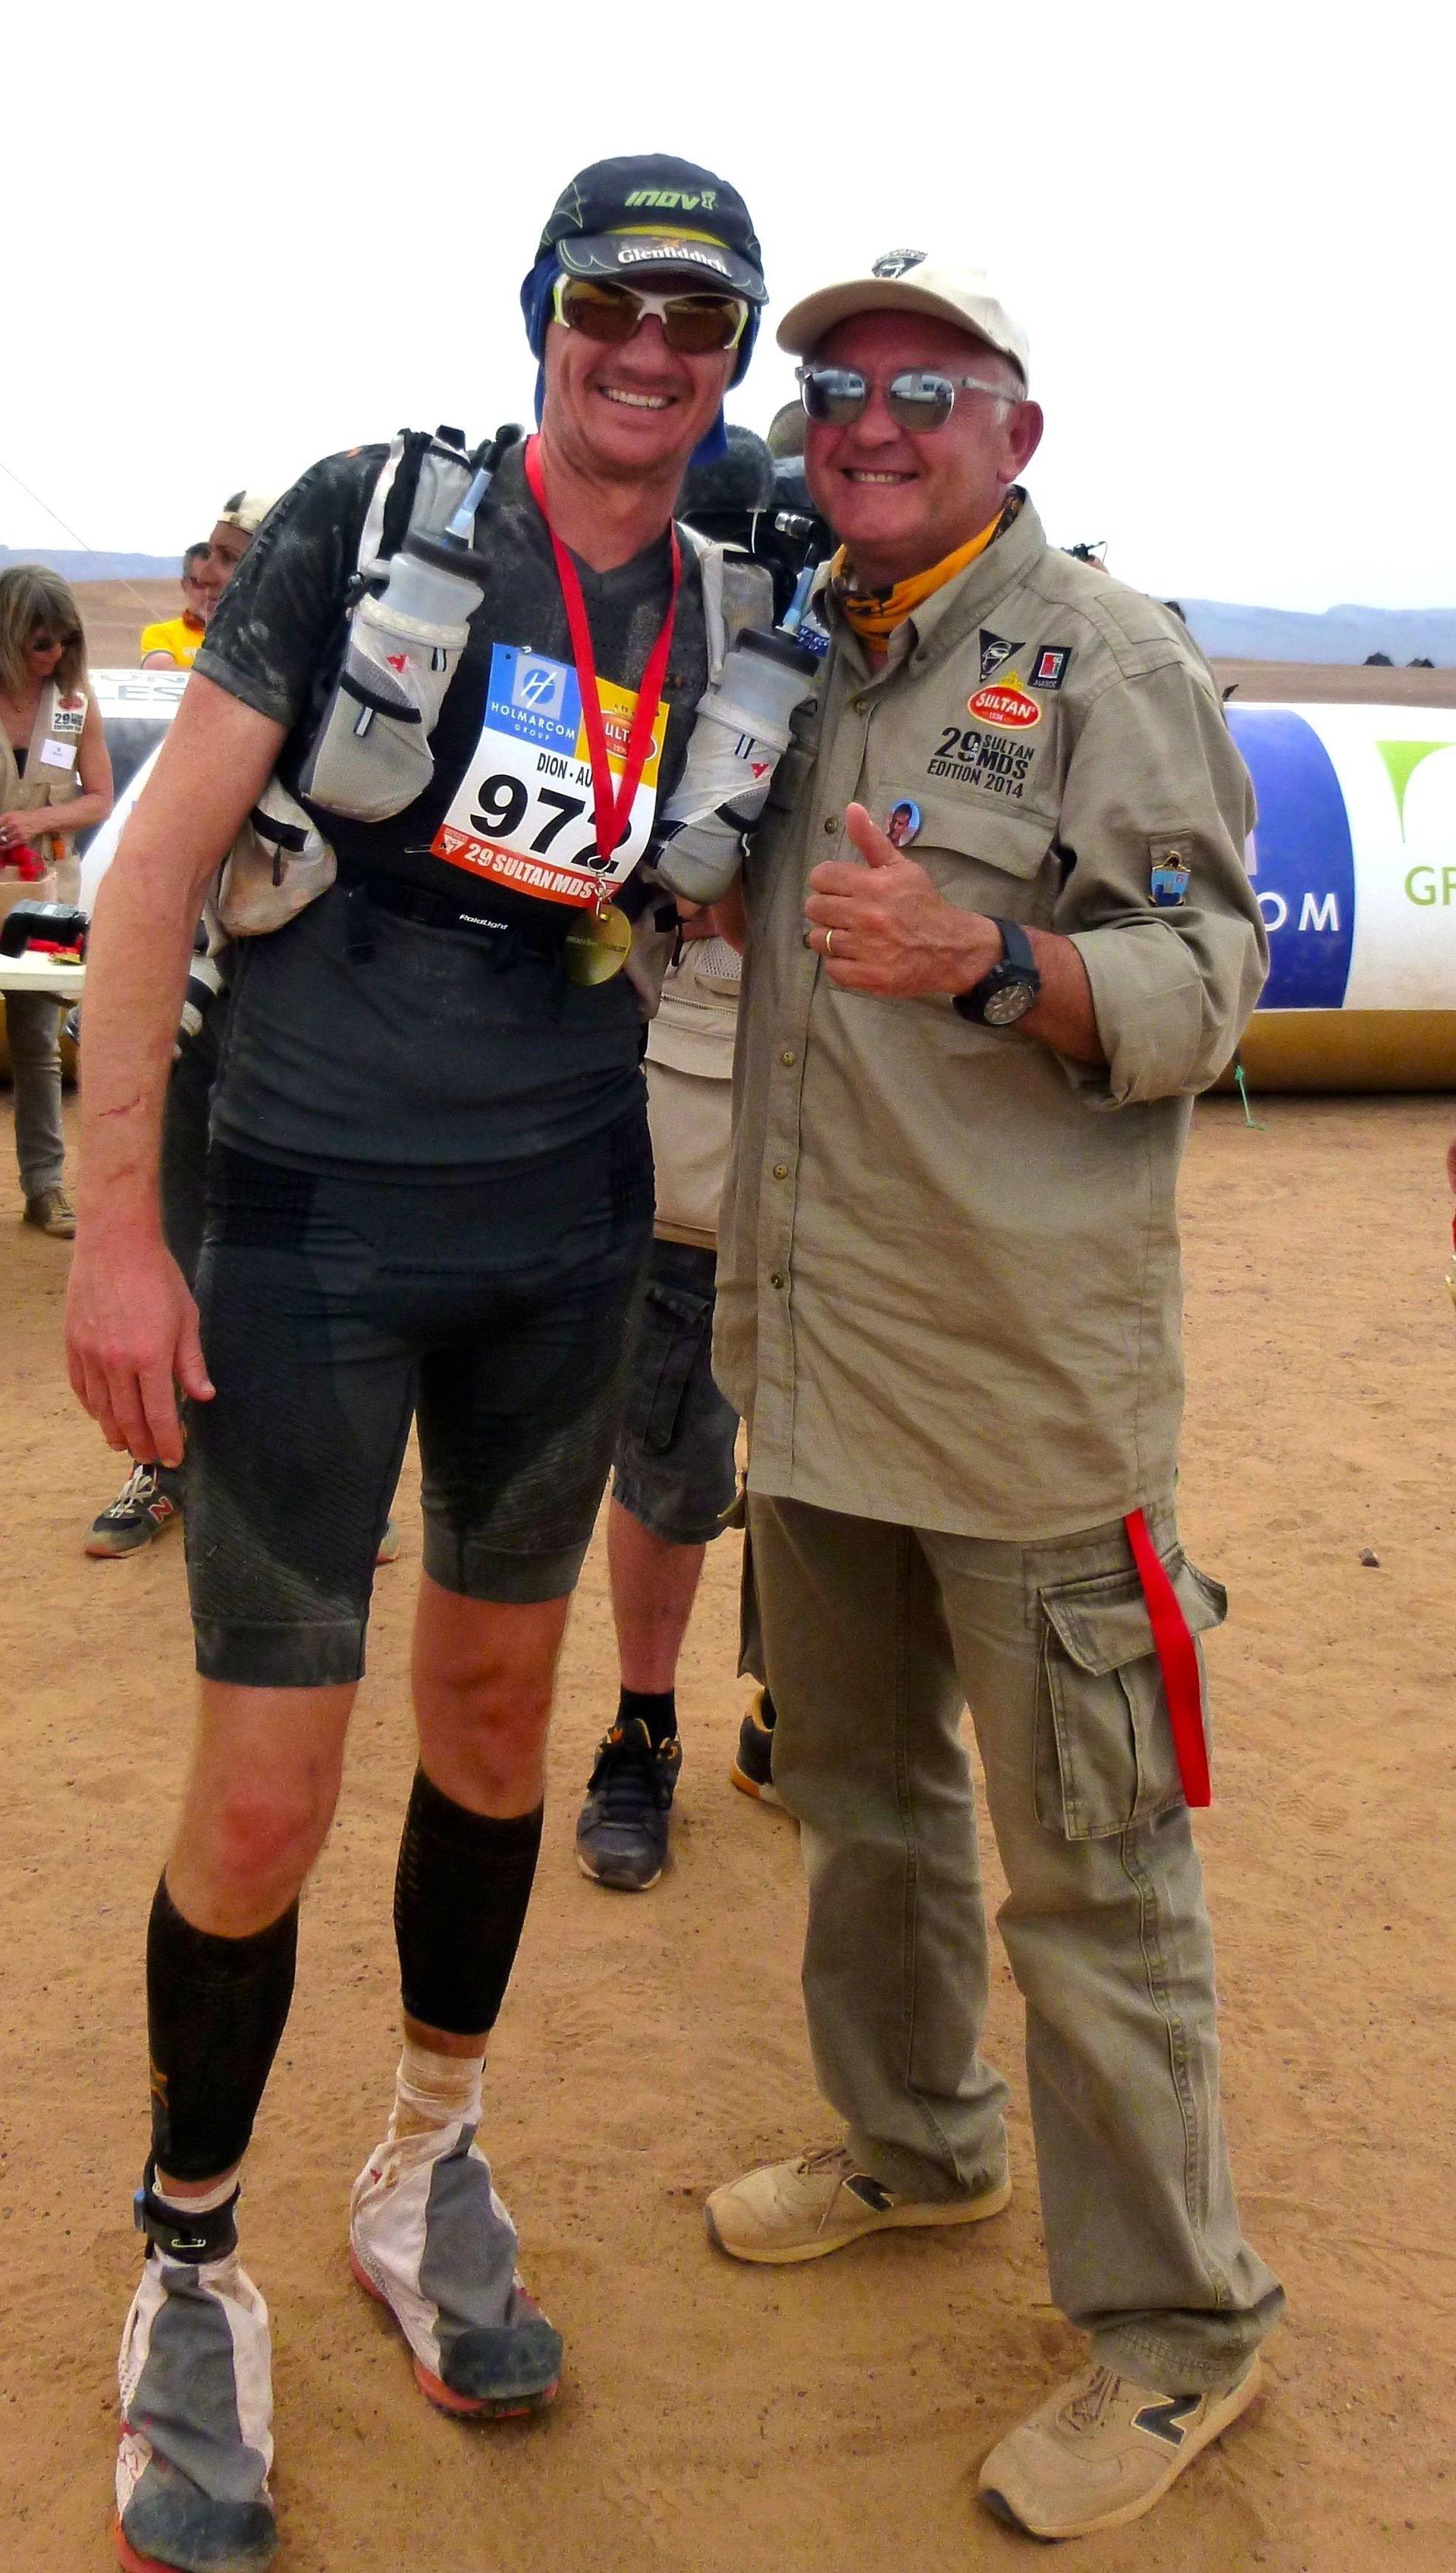 Dion Leonard., Morocco, Marathon Des Sables 250km 2014